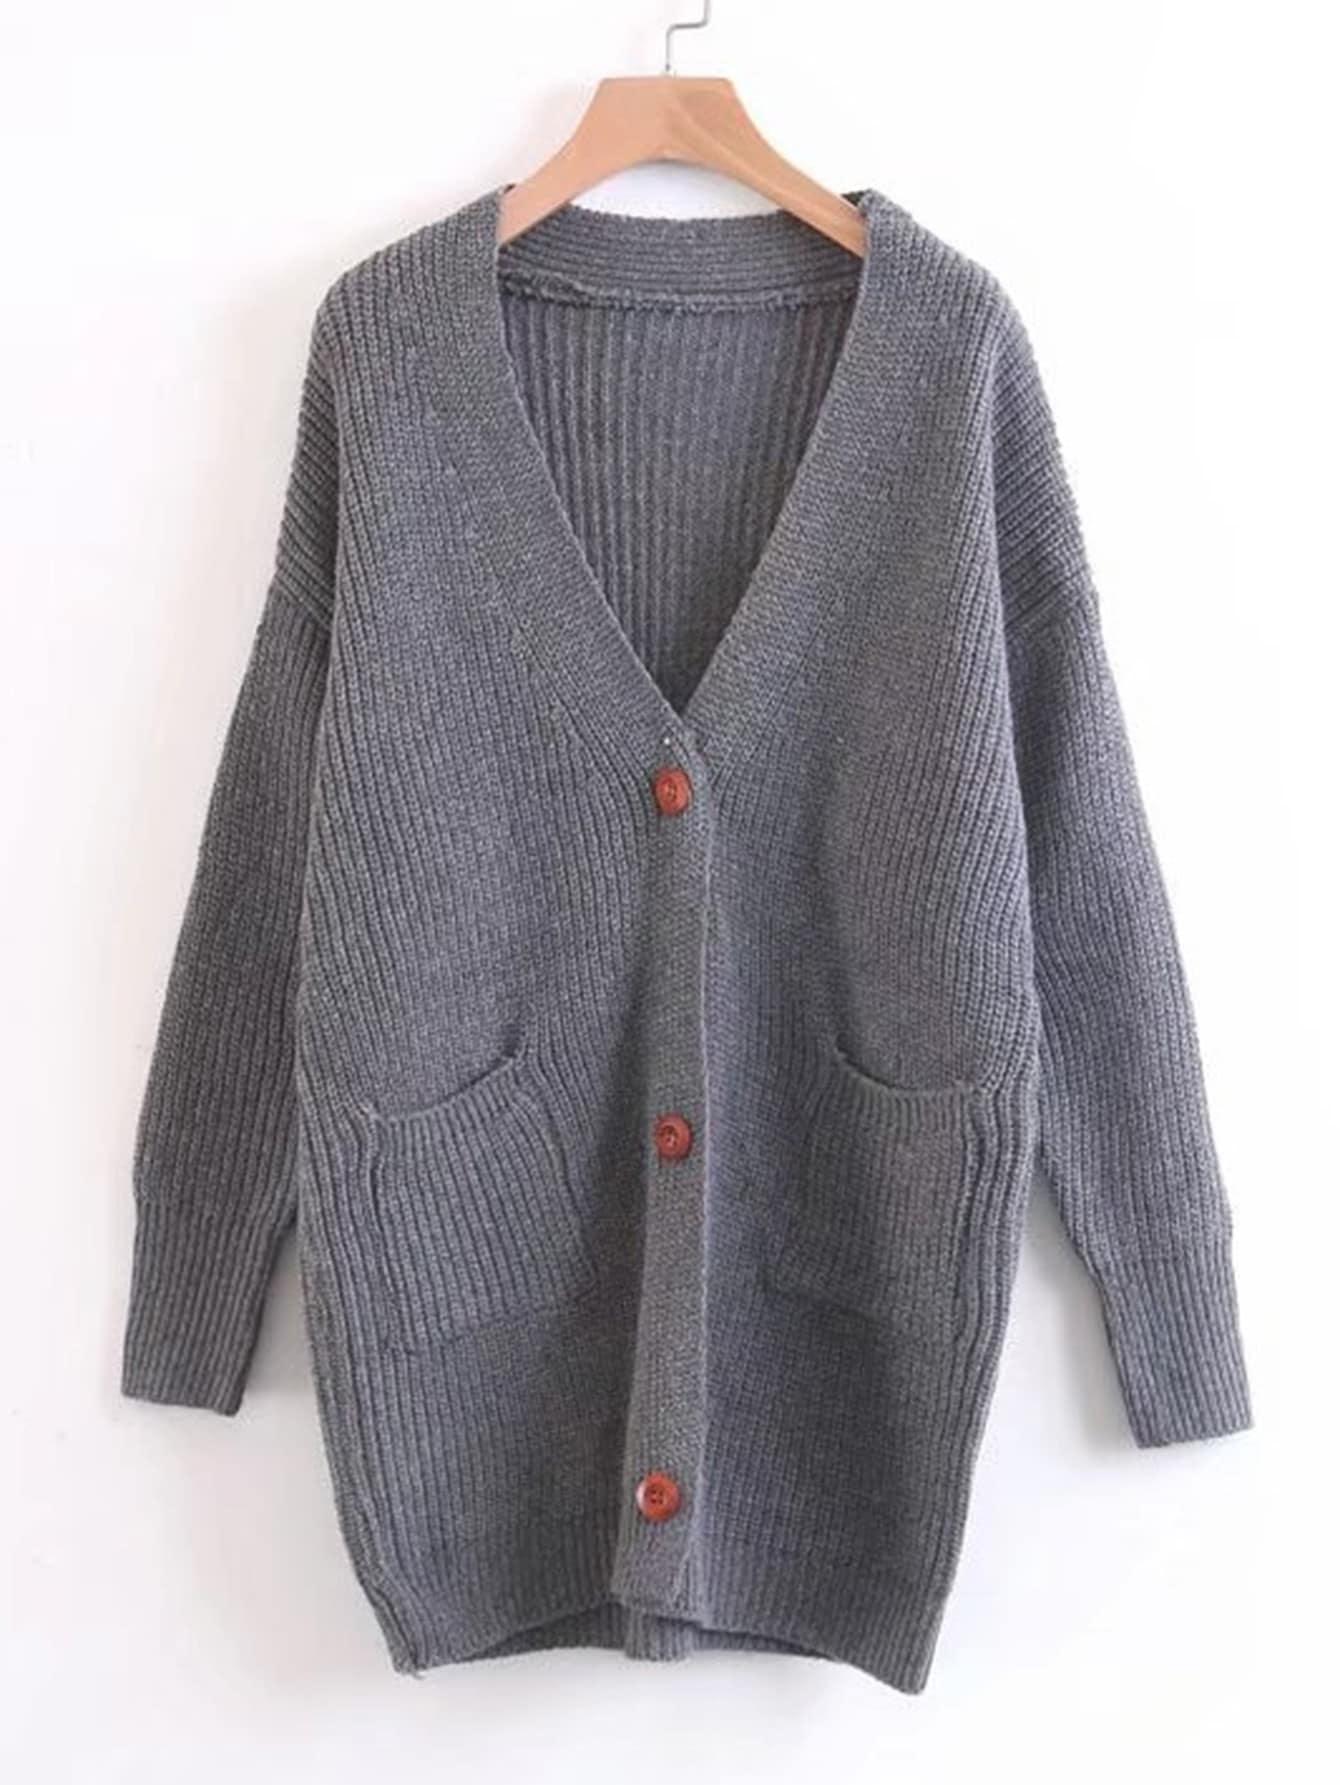 Longline Ribbed Knit Cardigan sweater170925203